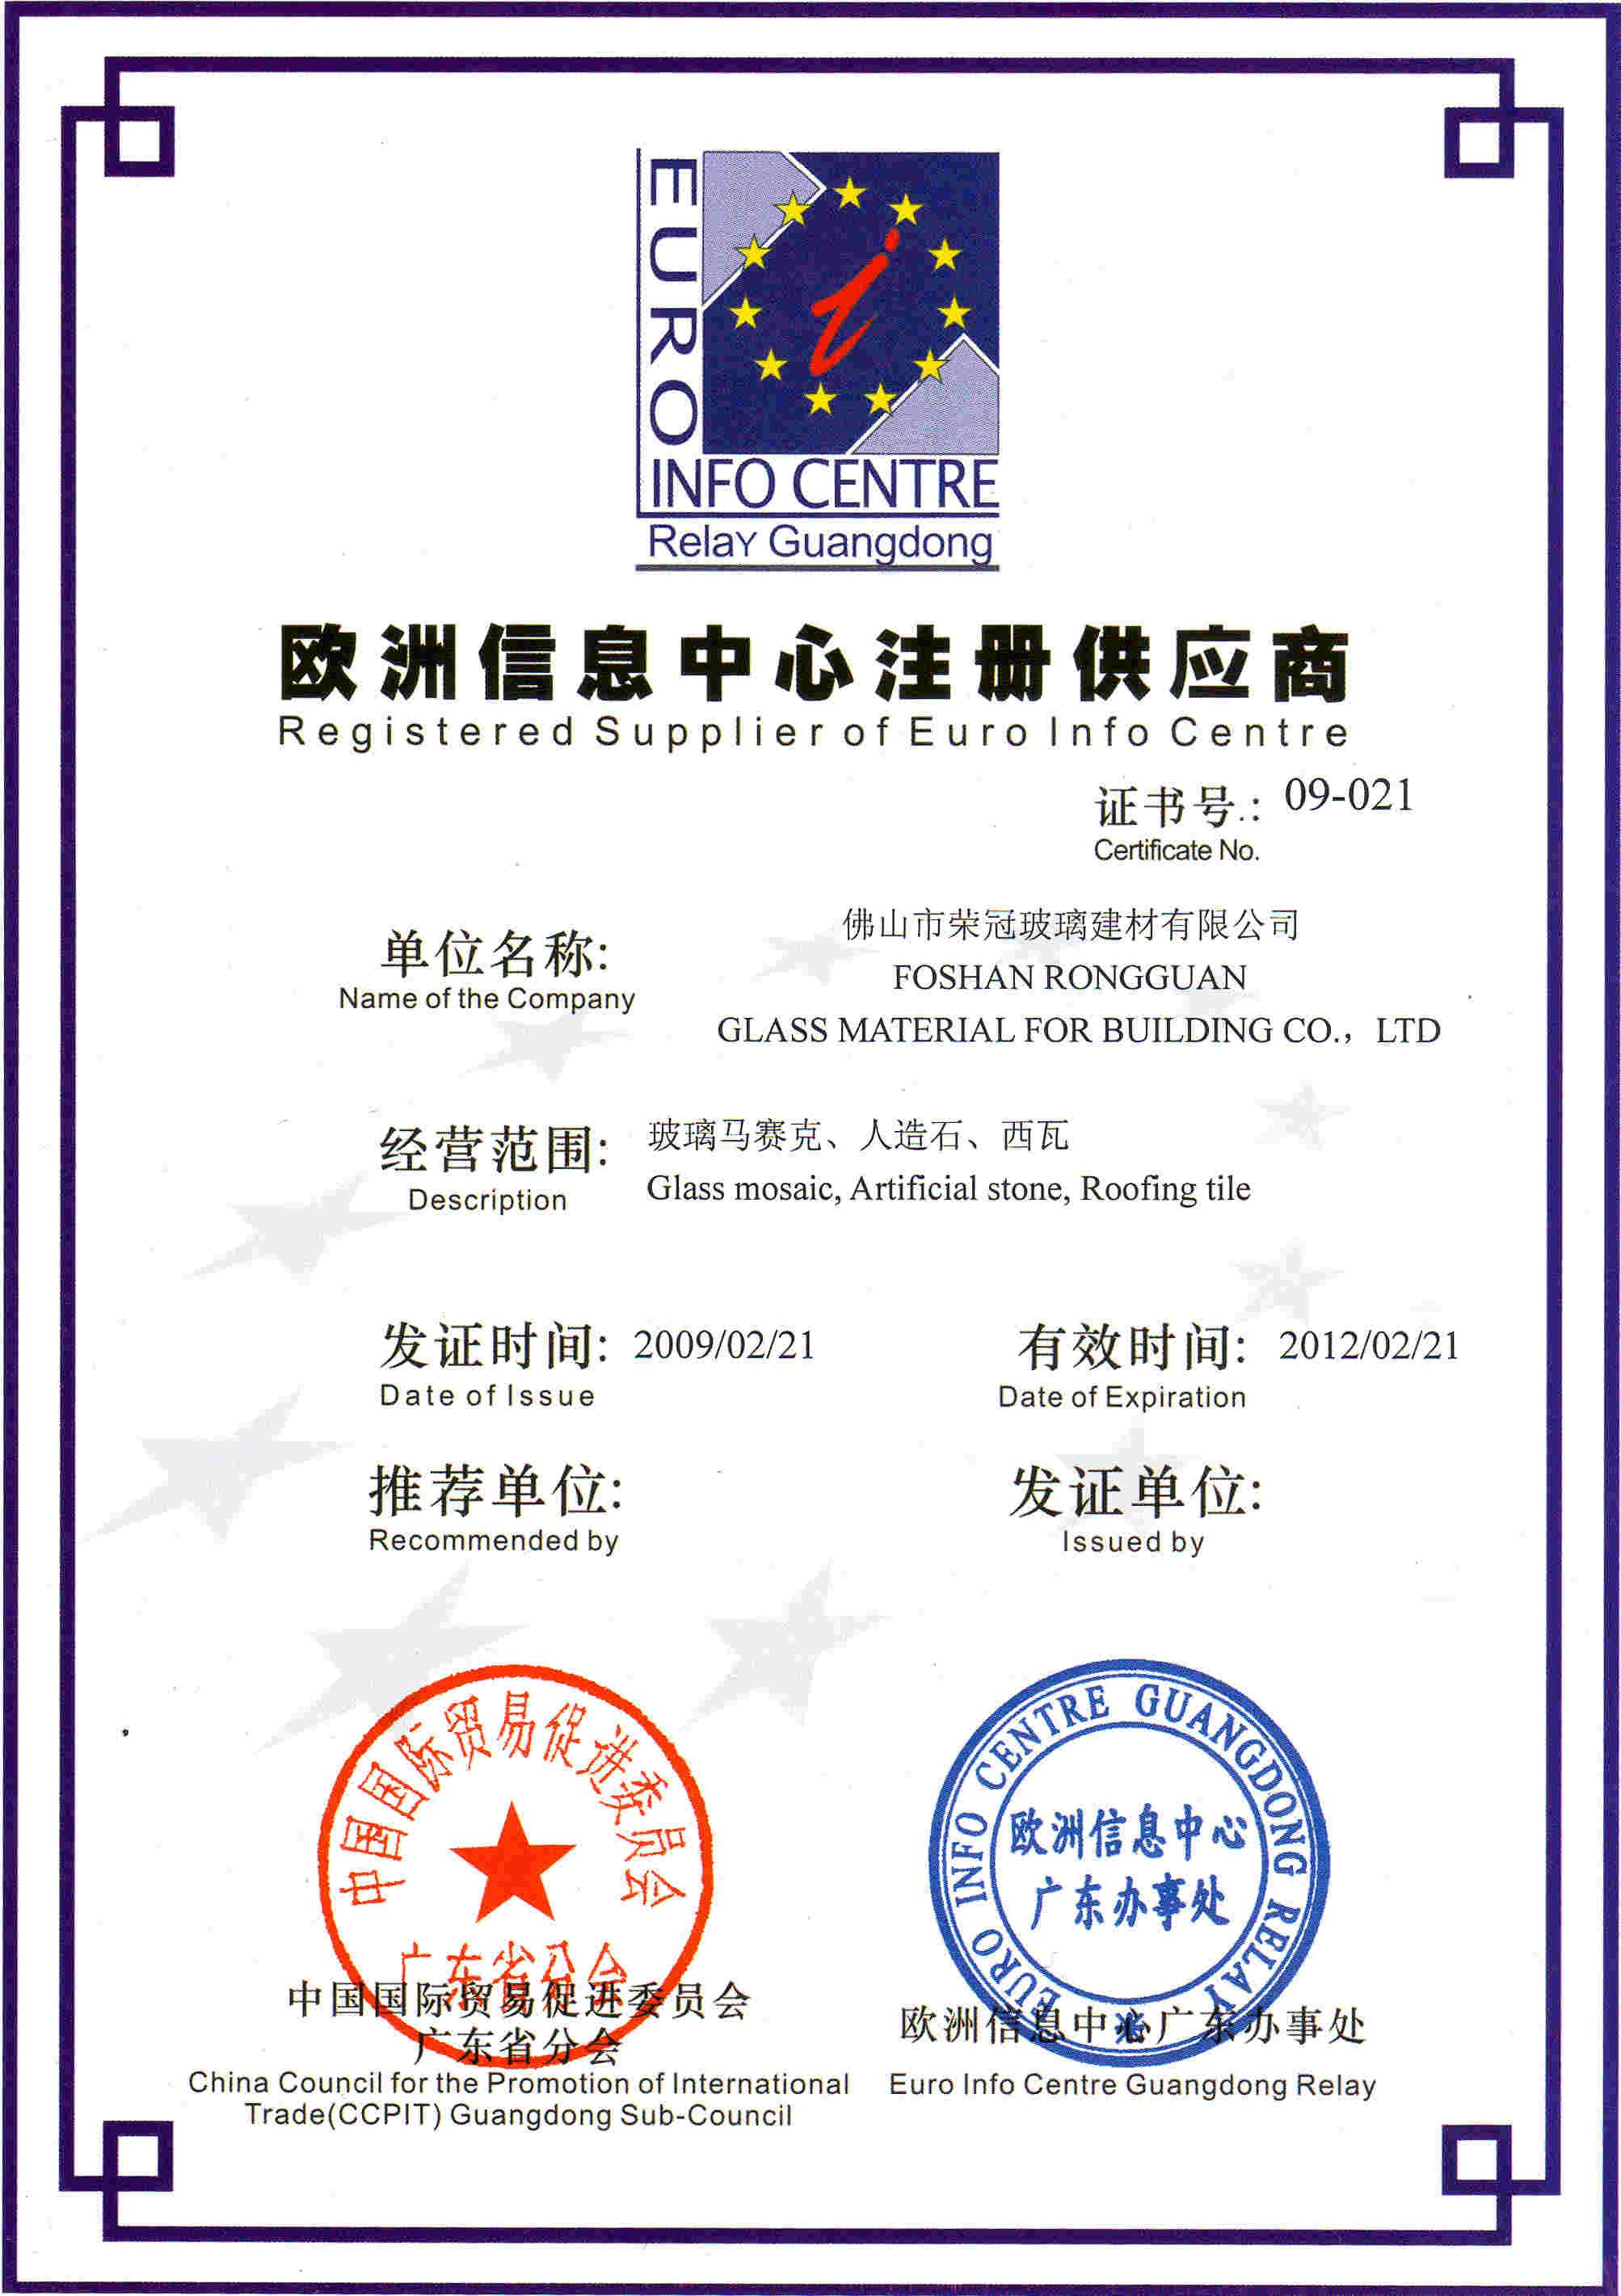 Registered Supplier of Euro Info Centre